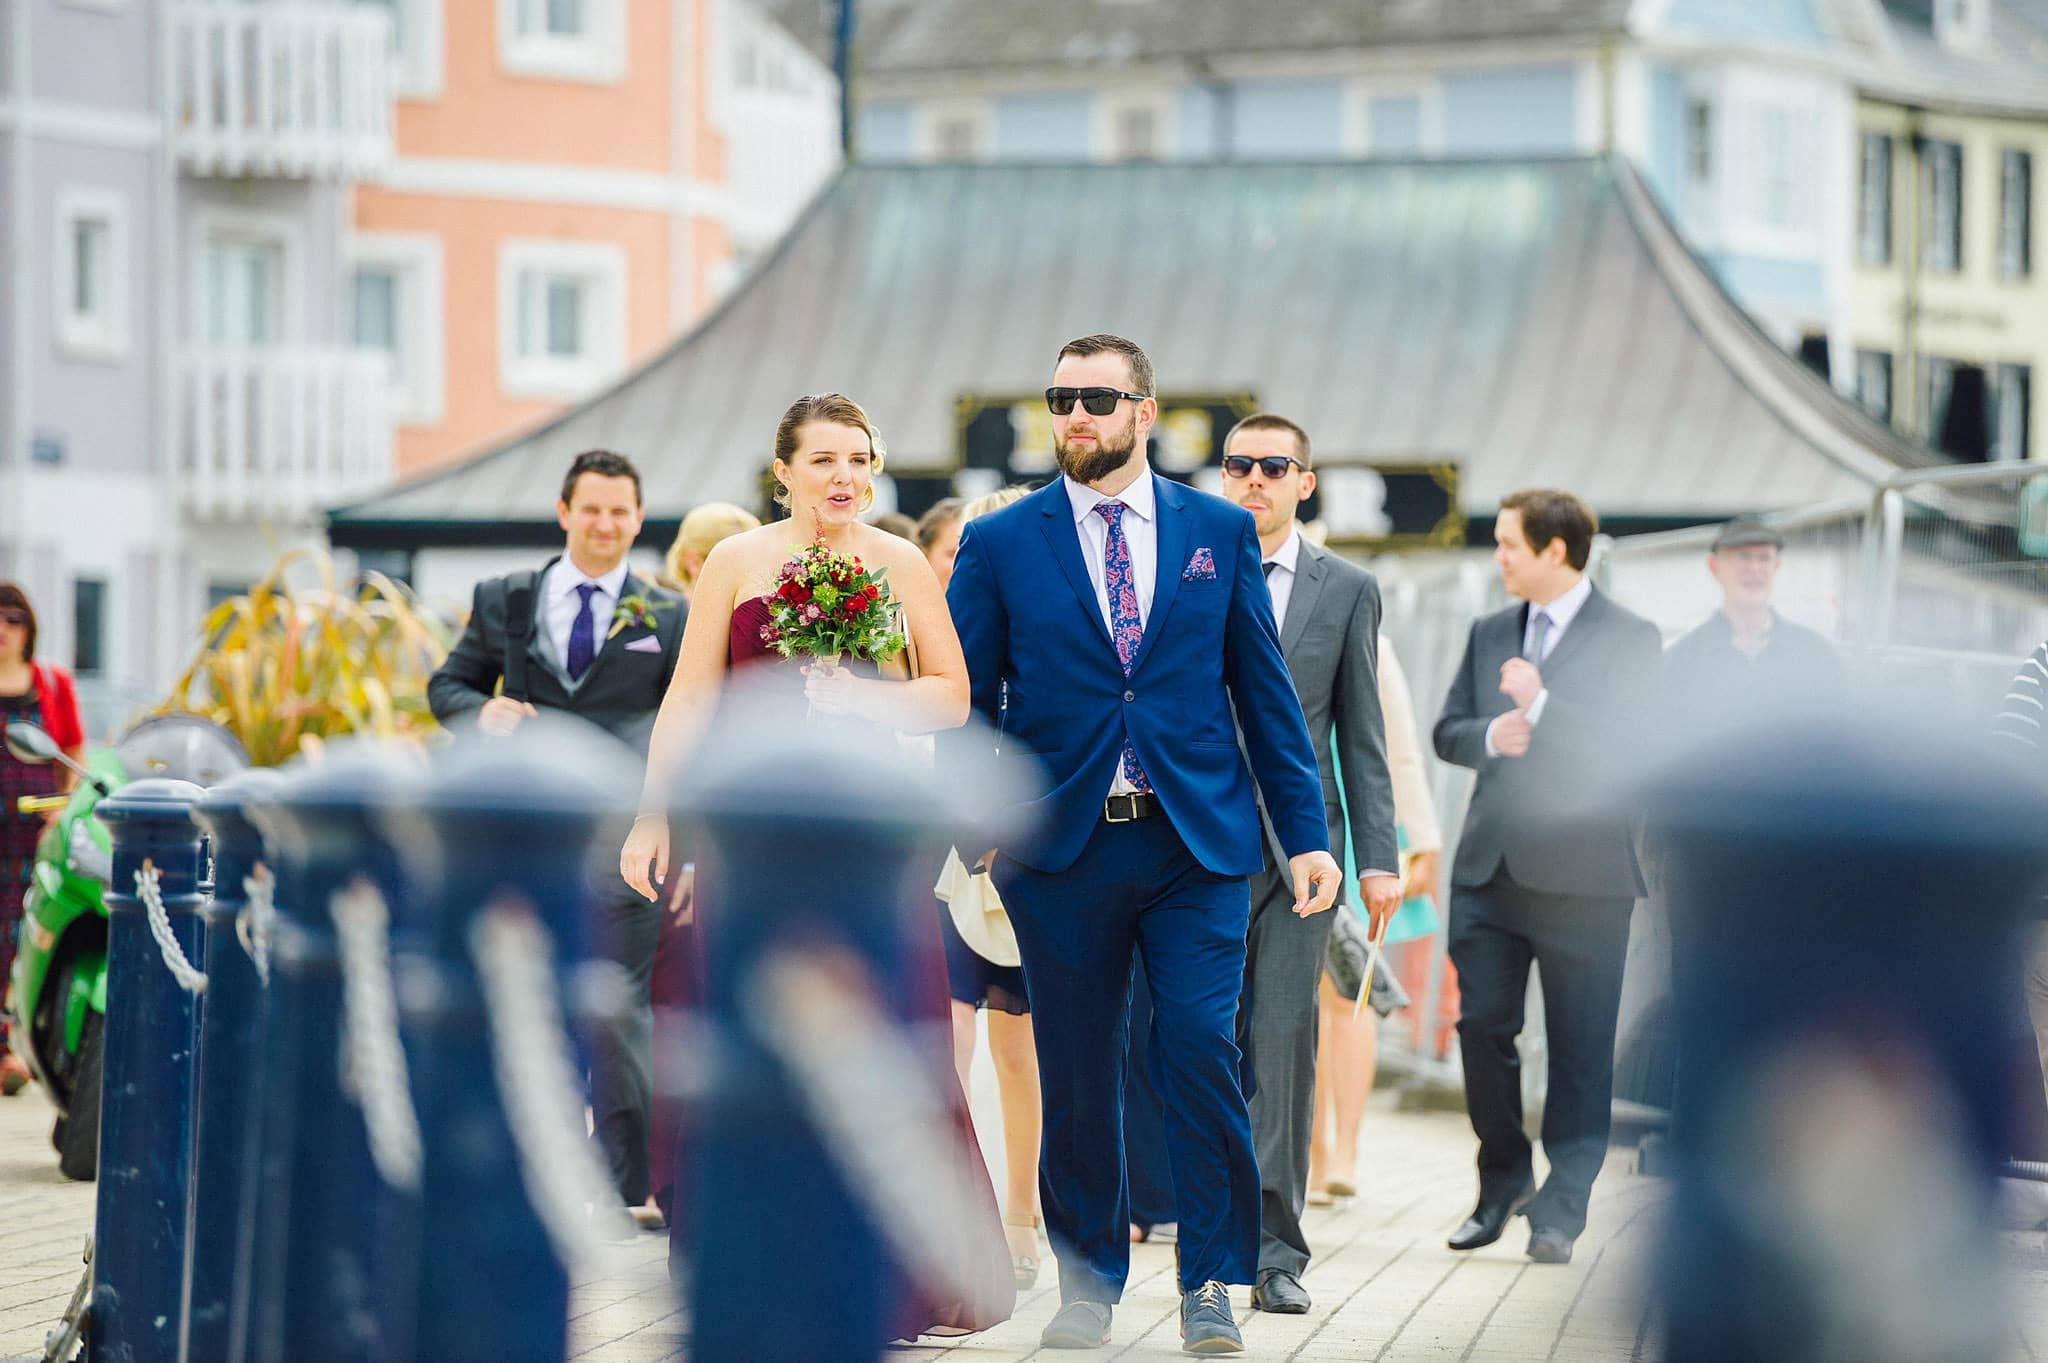 wedding-photographer-aberystwyth-wales (100)